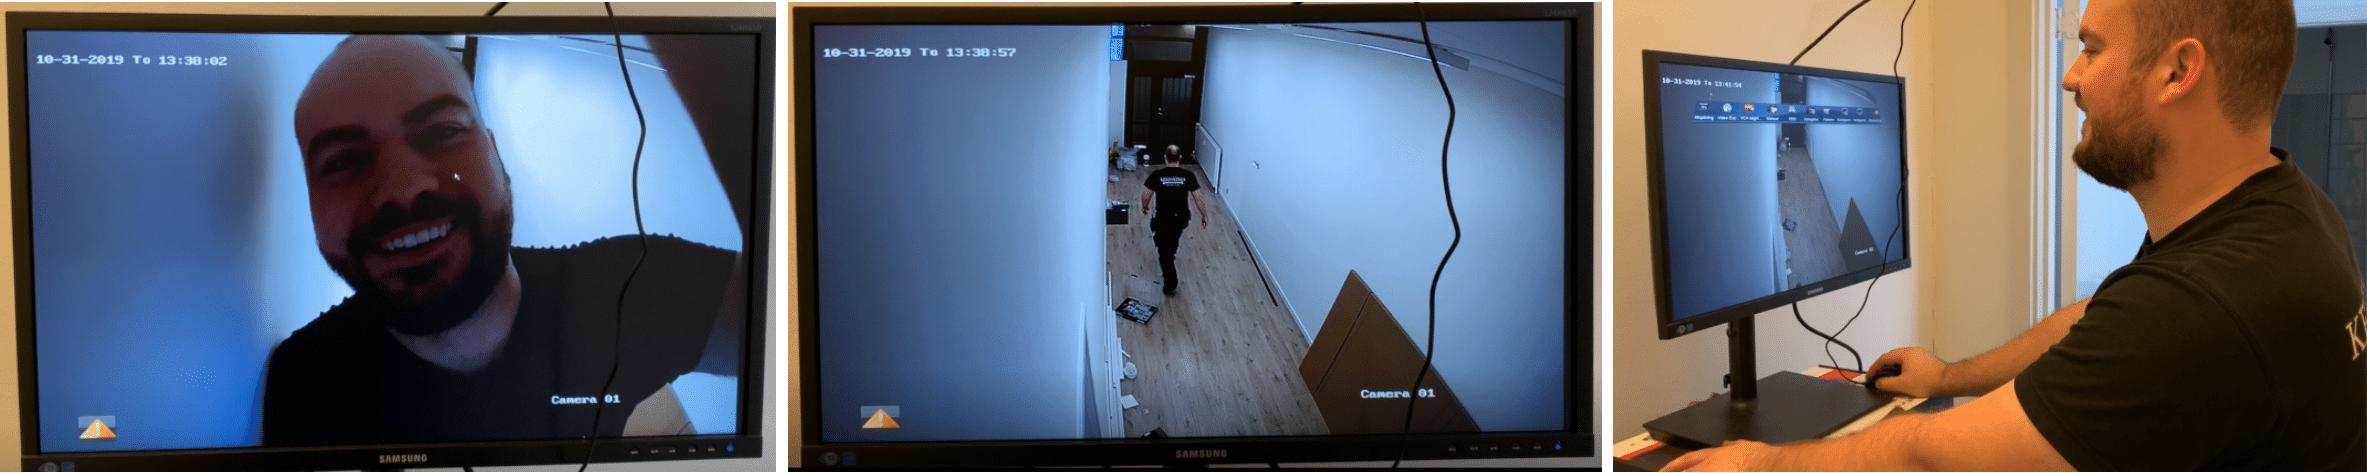 Videoovervågning hos LH træbyg